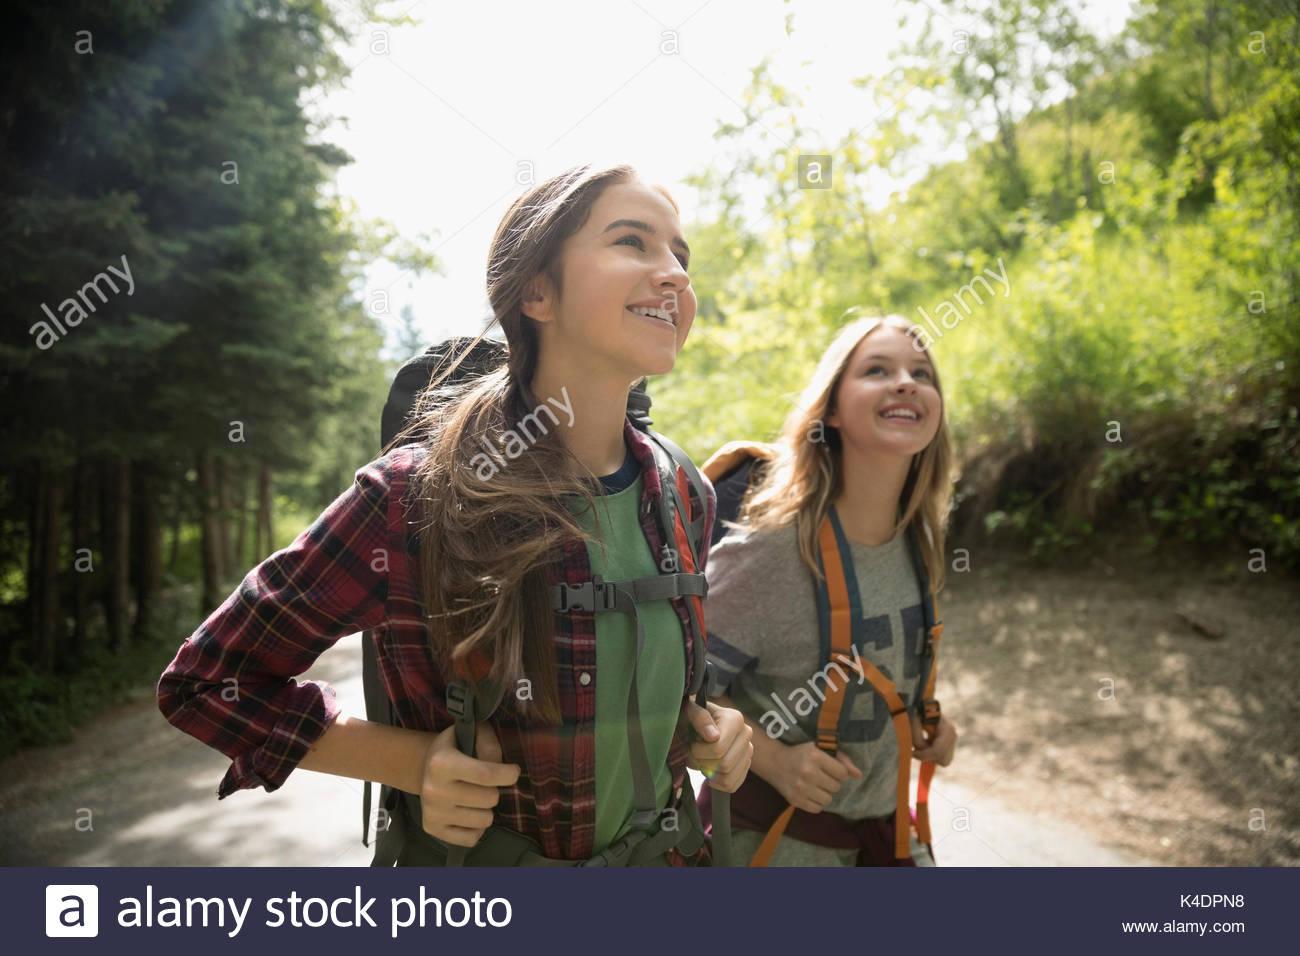 Neugierig, lächelnden Teenager Freunde mit Rucksäcke wandern in Holz Stockbild